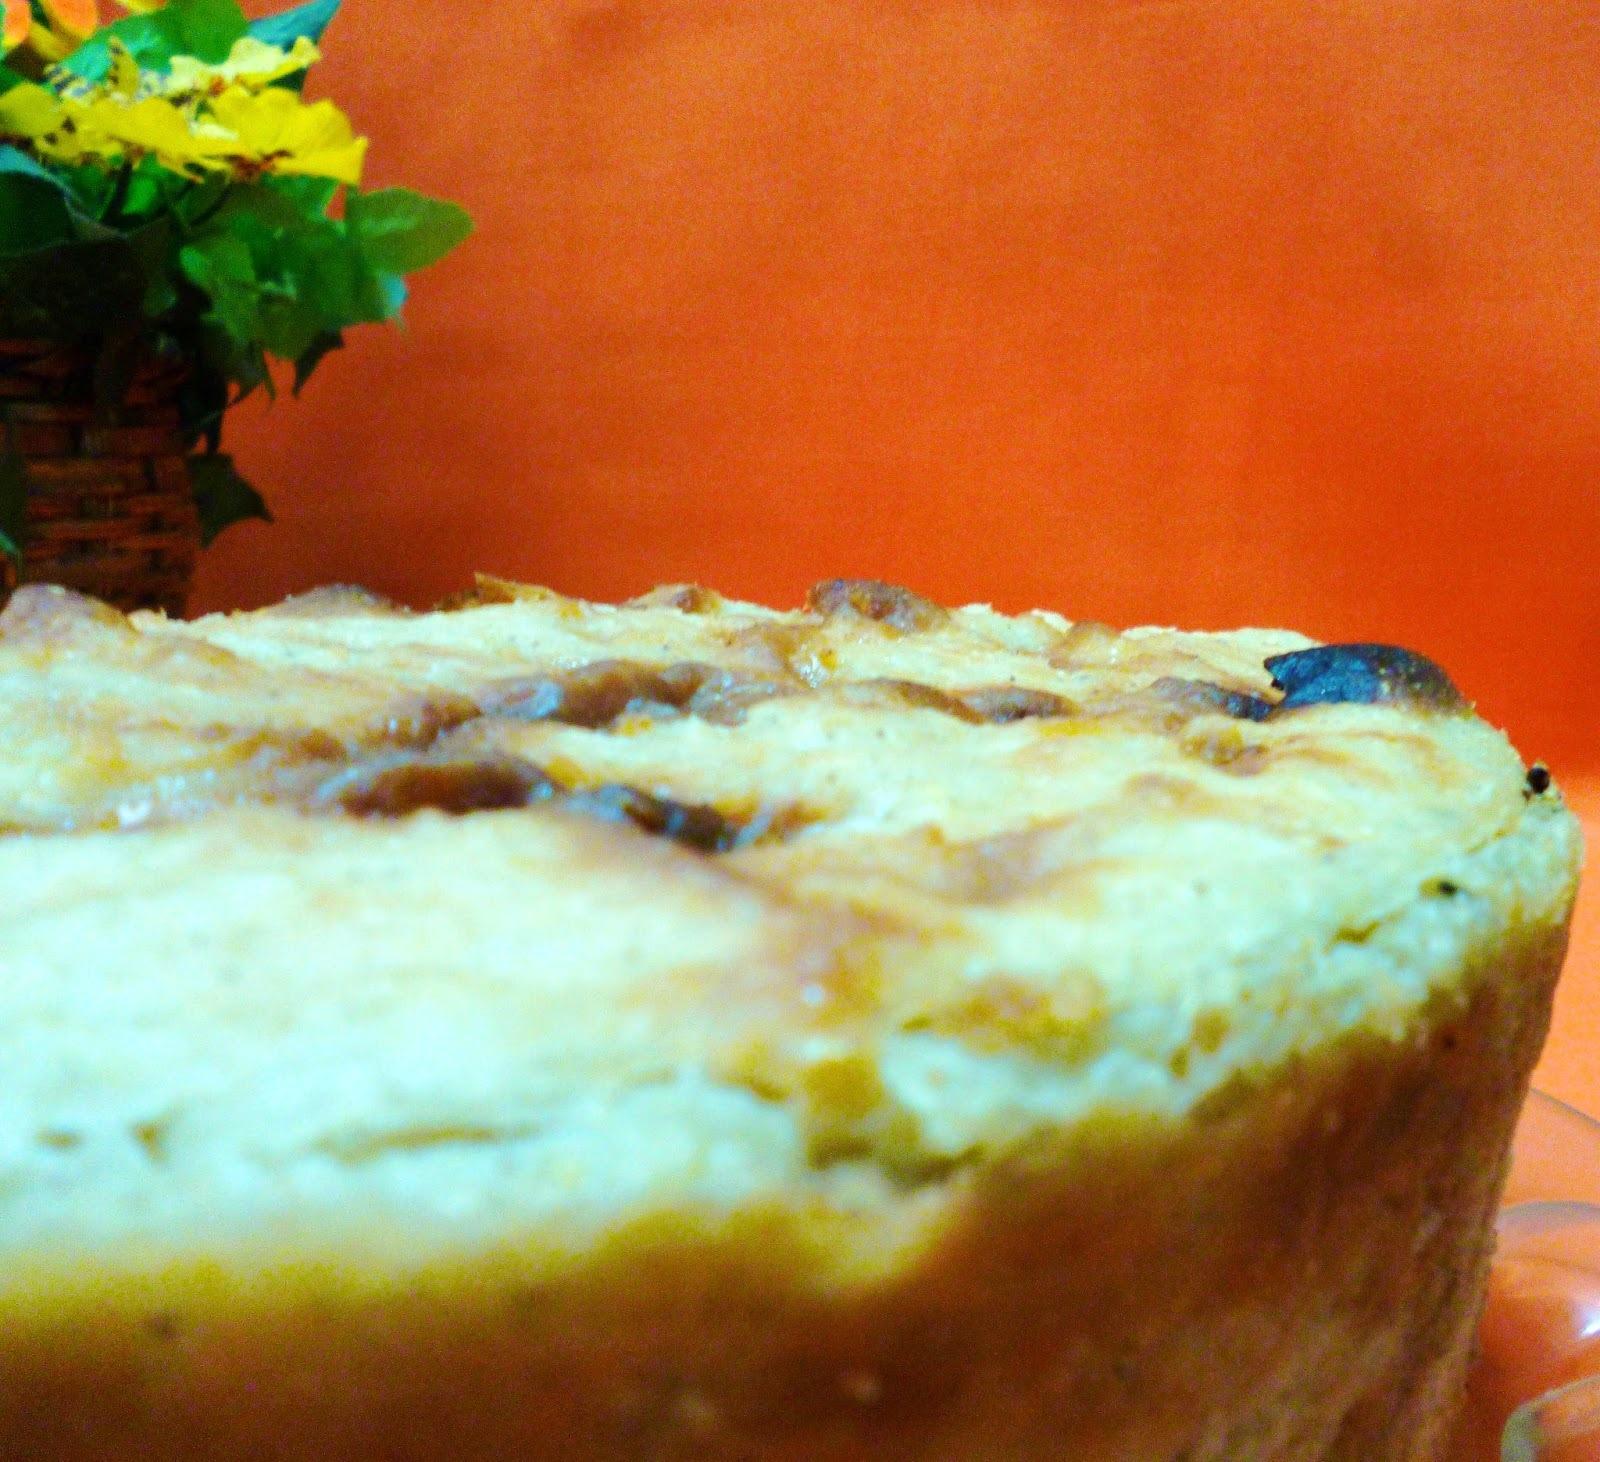 Tamal asado casero